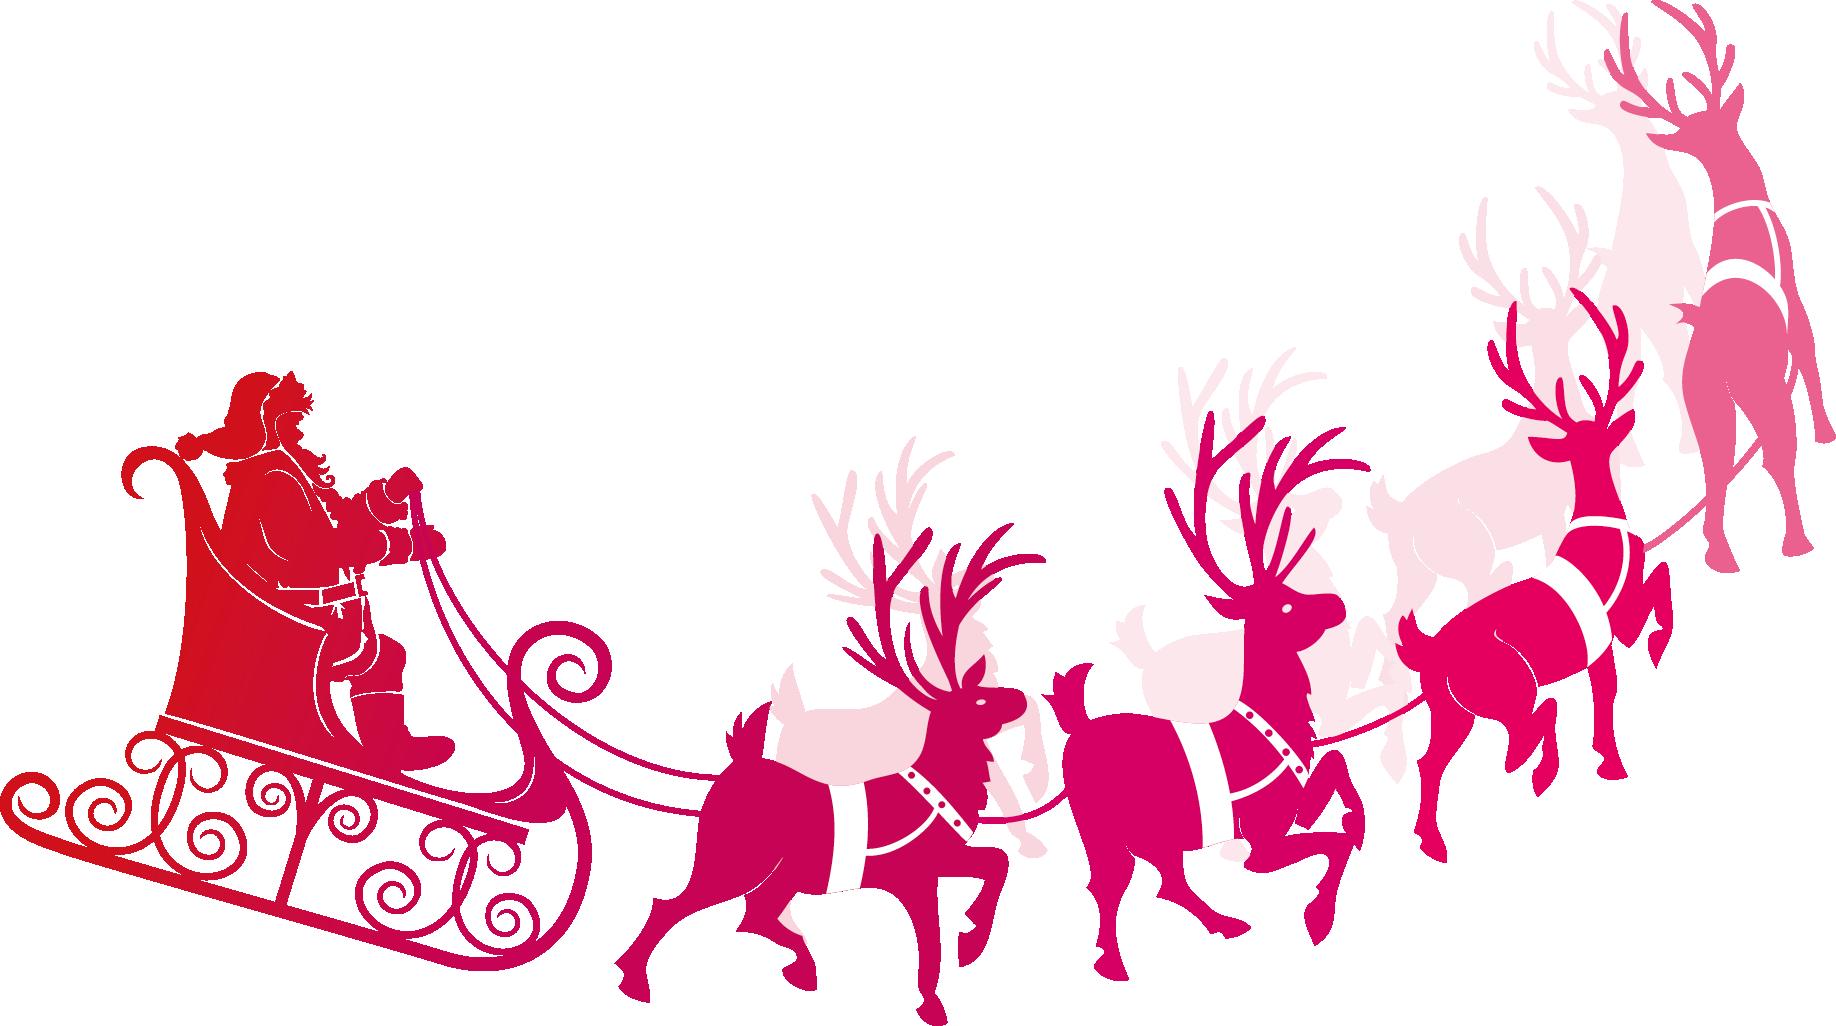 Clipart santa rudolph. And his sleigh at